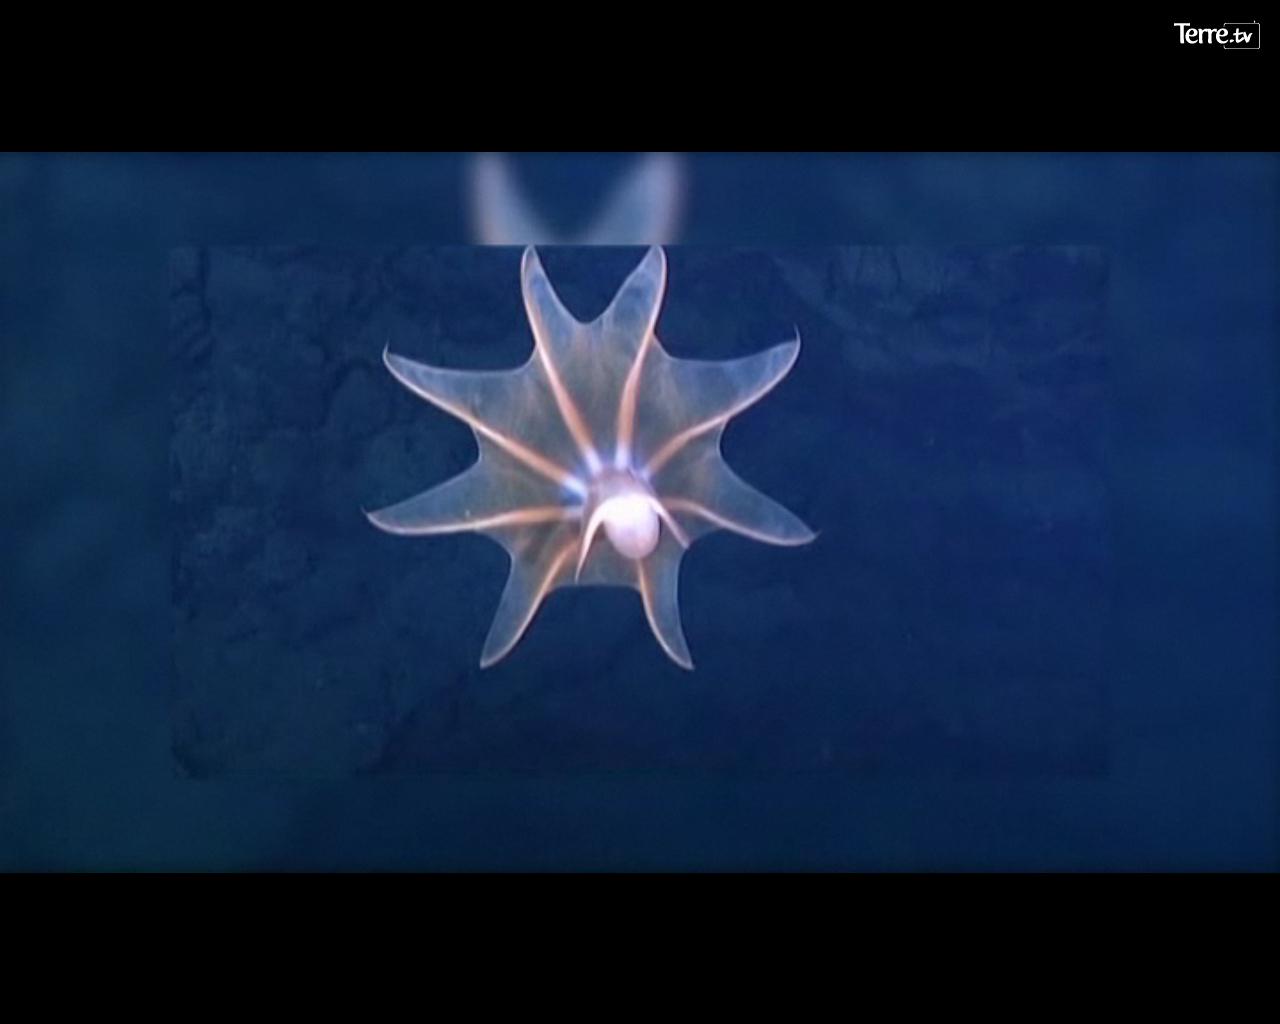 fonds marin